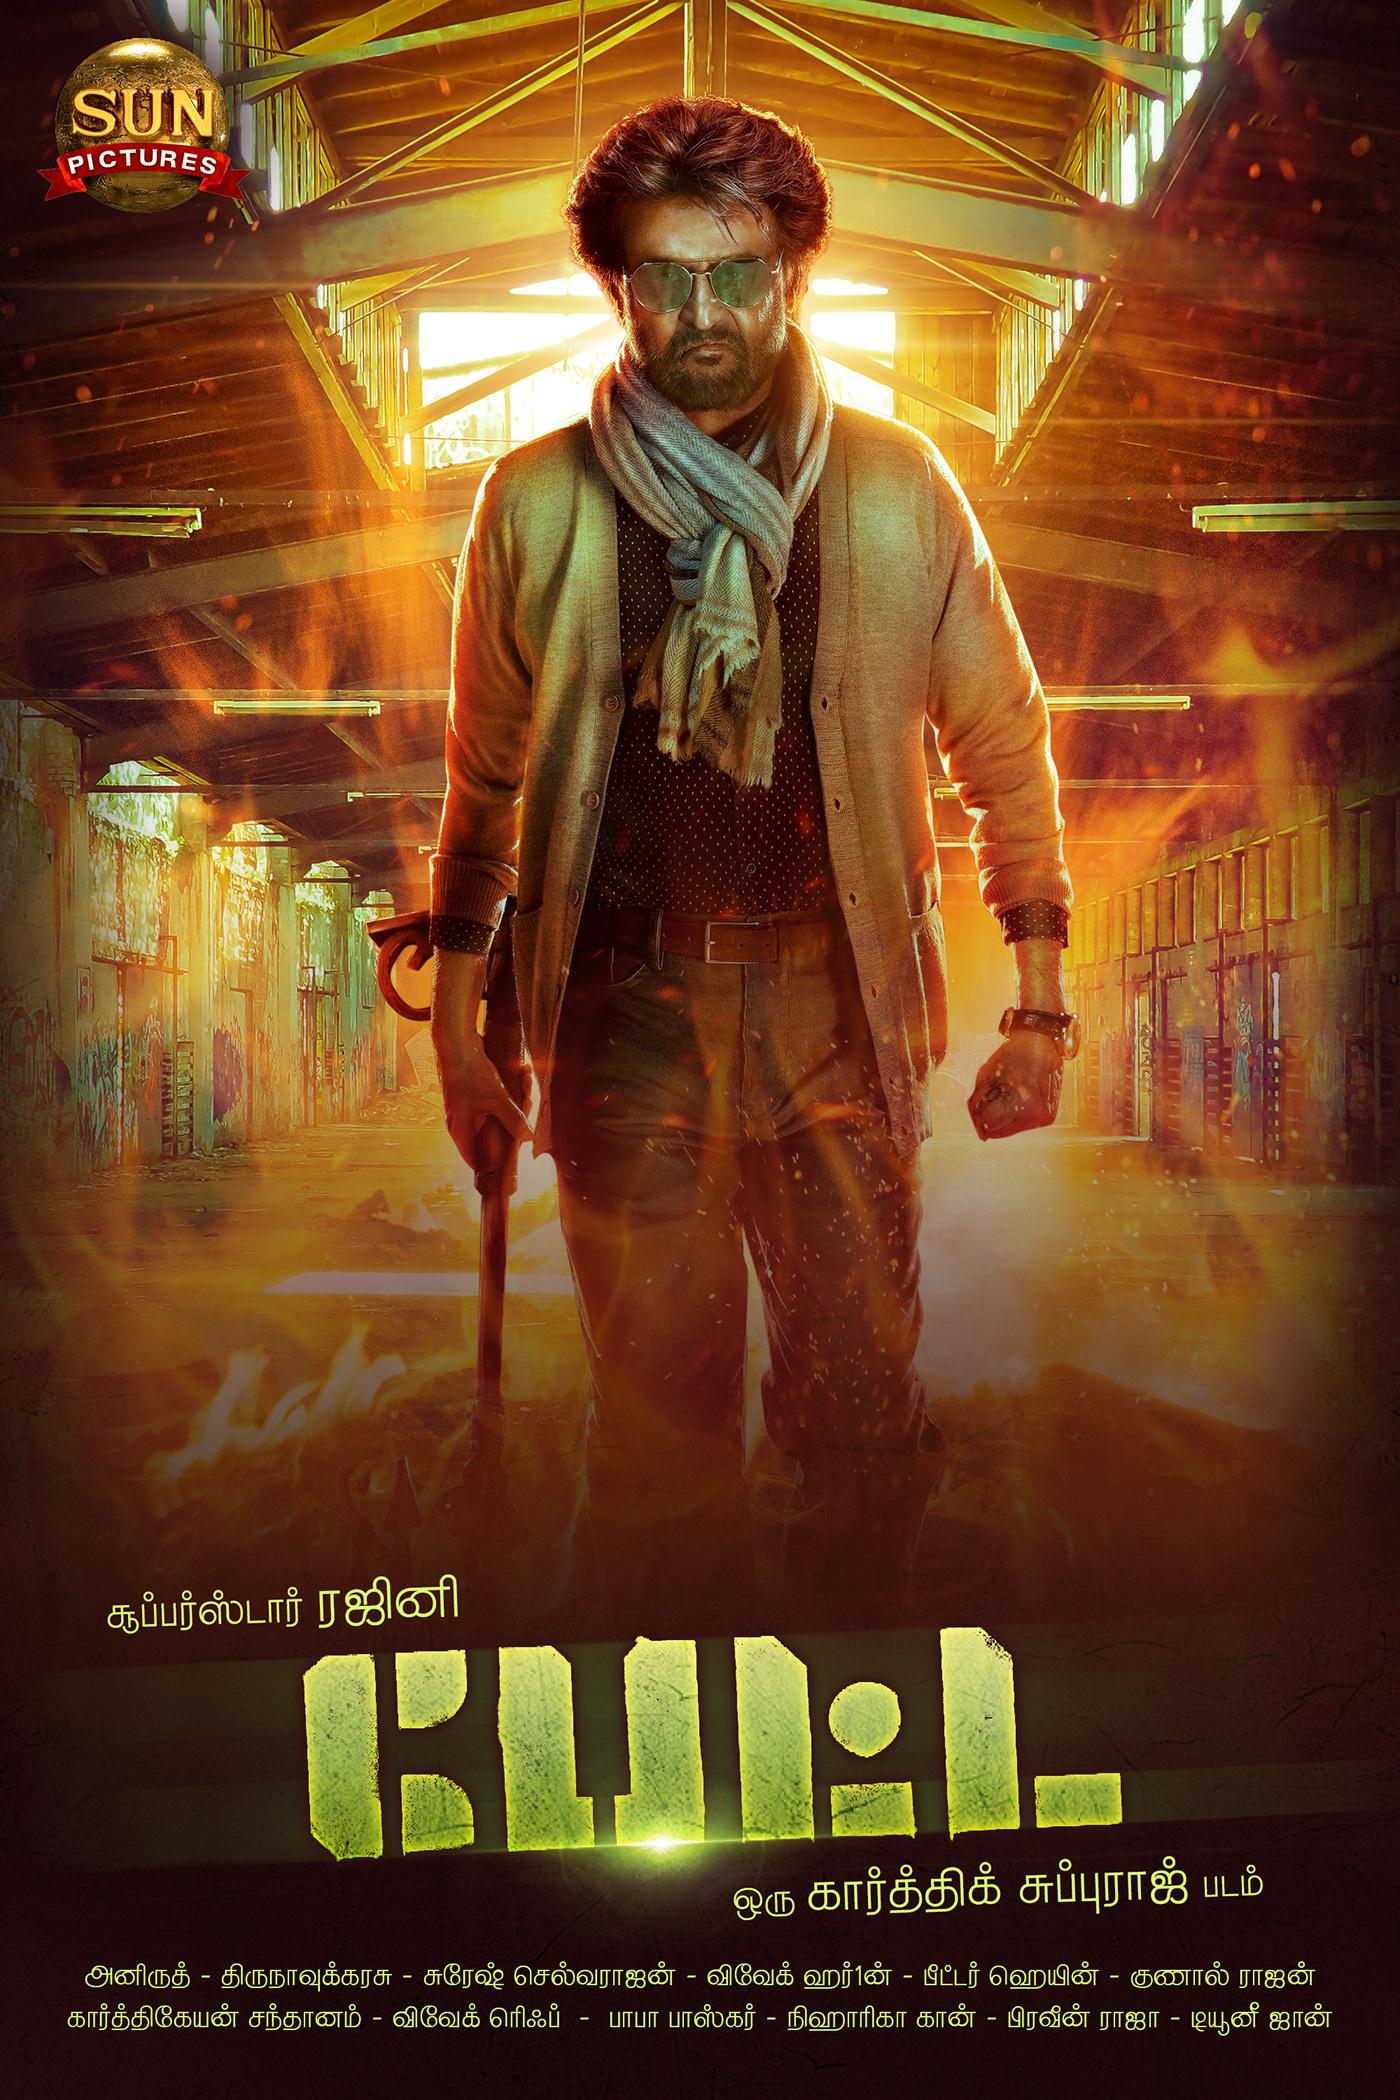 Petta Movie Poster Design On Behance